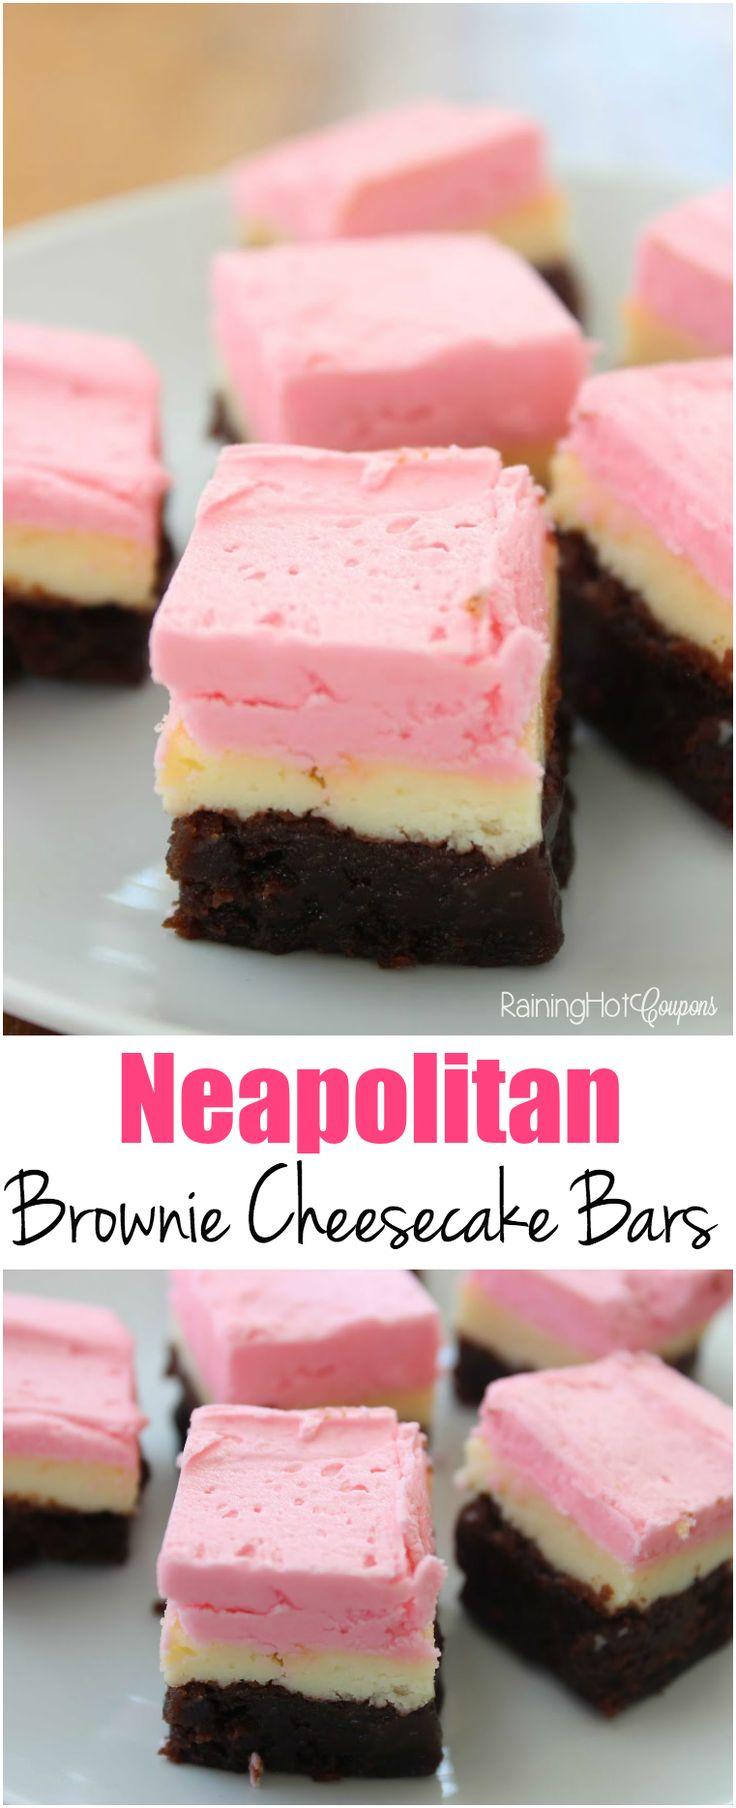 Neapolitan Look Brownie Cheesecake Bars